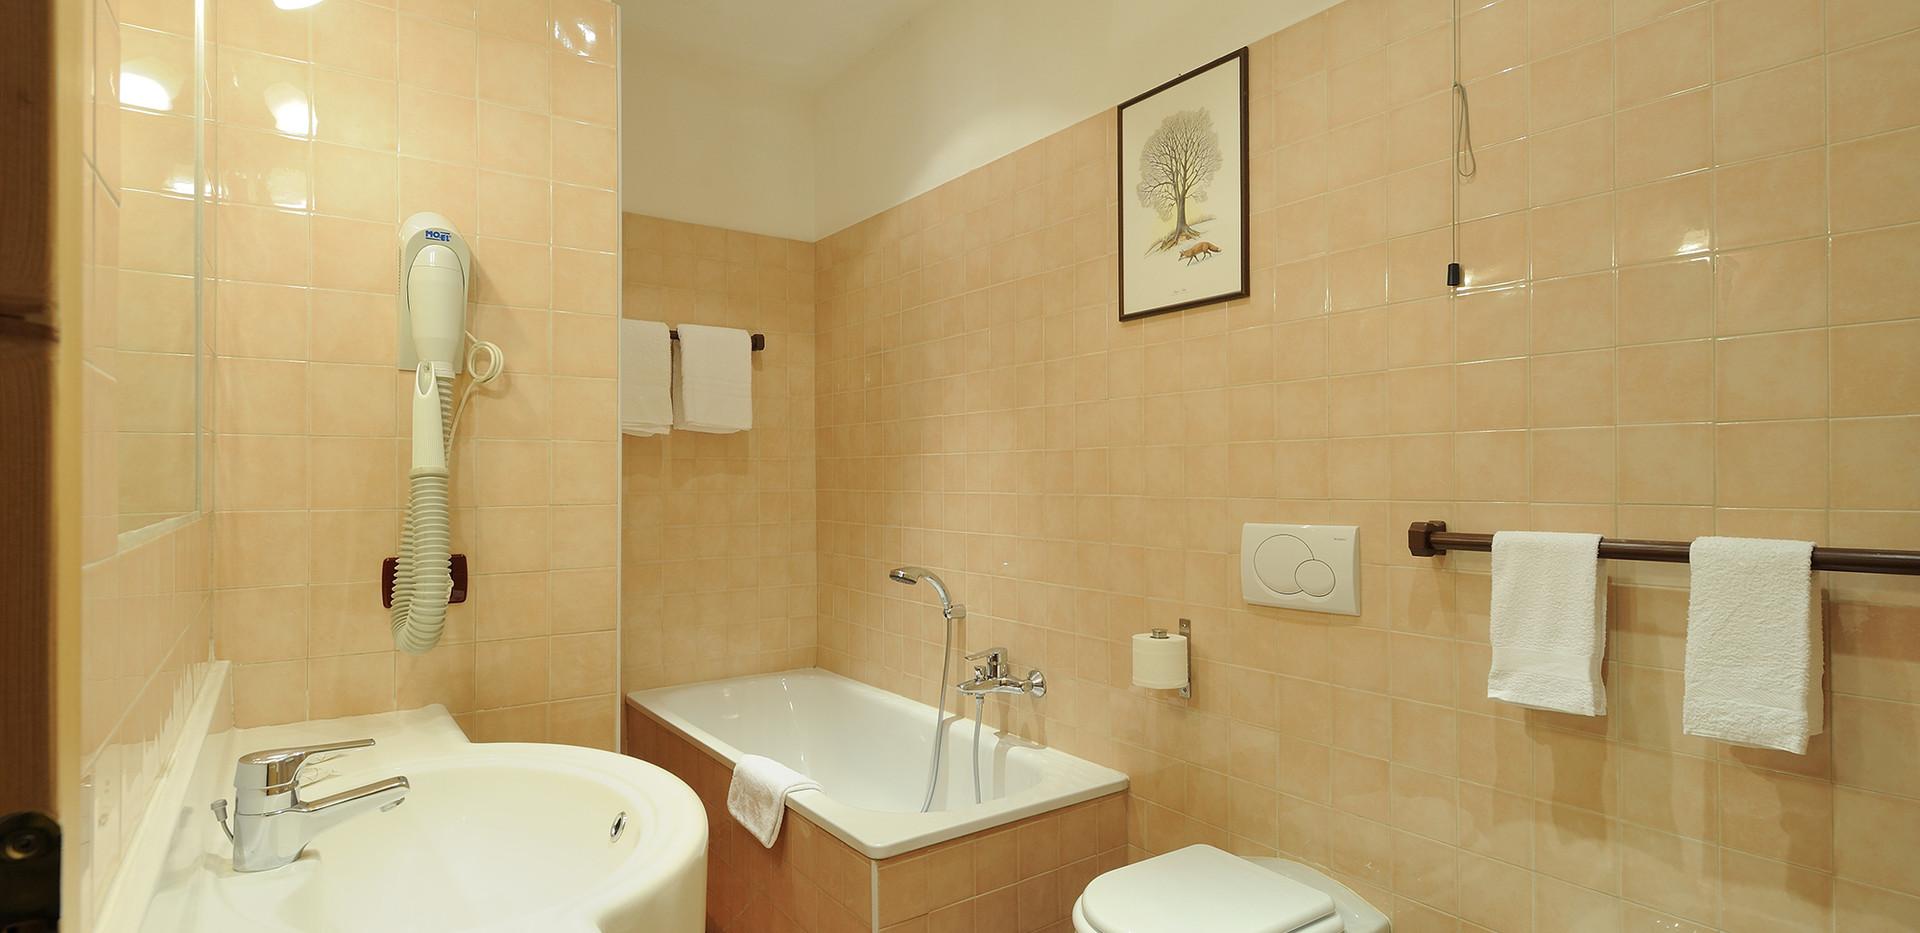 Eco - bagno con vasca